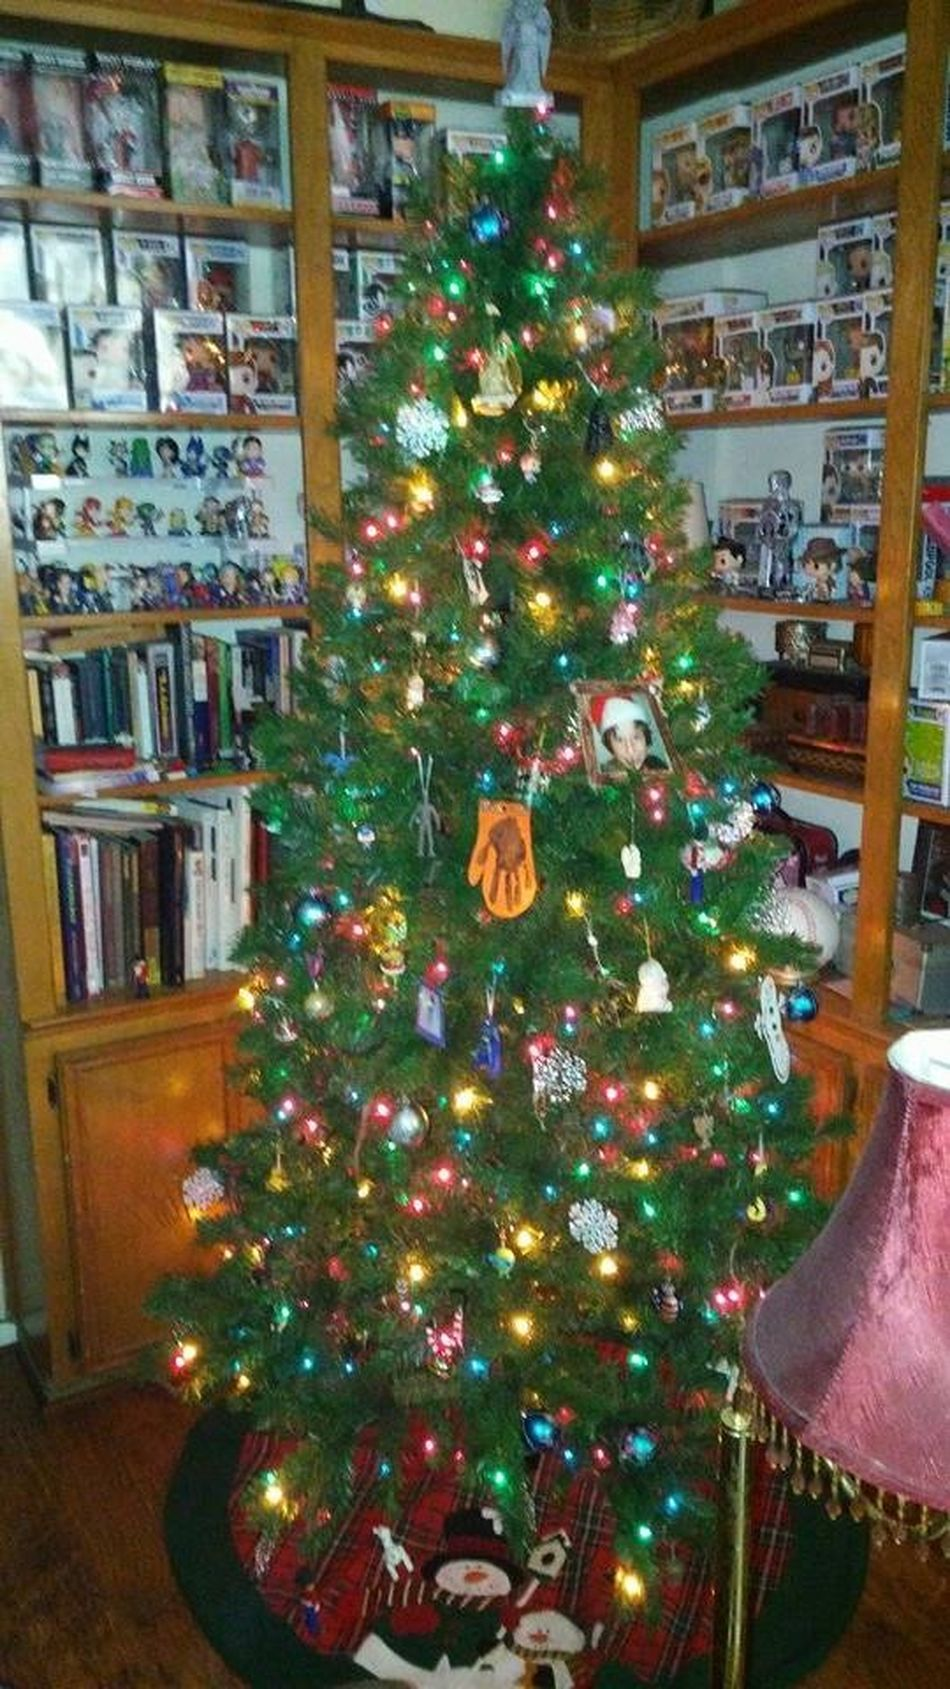 Christmas Tree Friend's House Festive Season Pop Collection